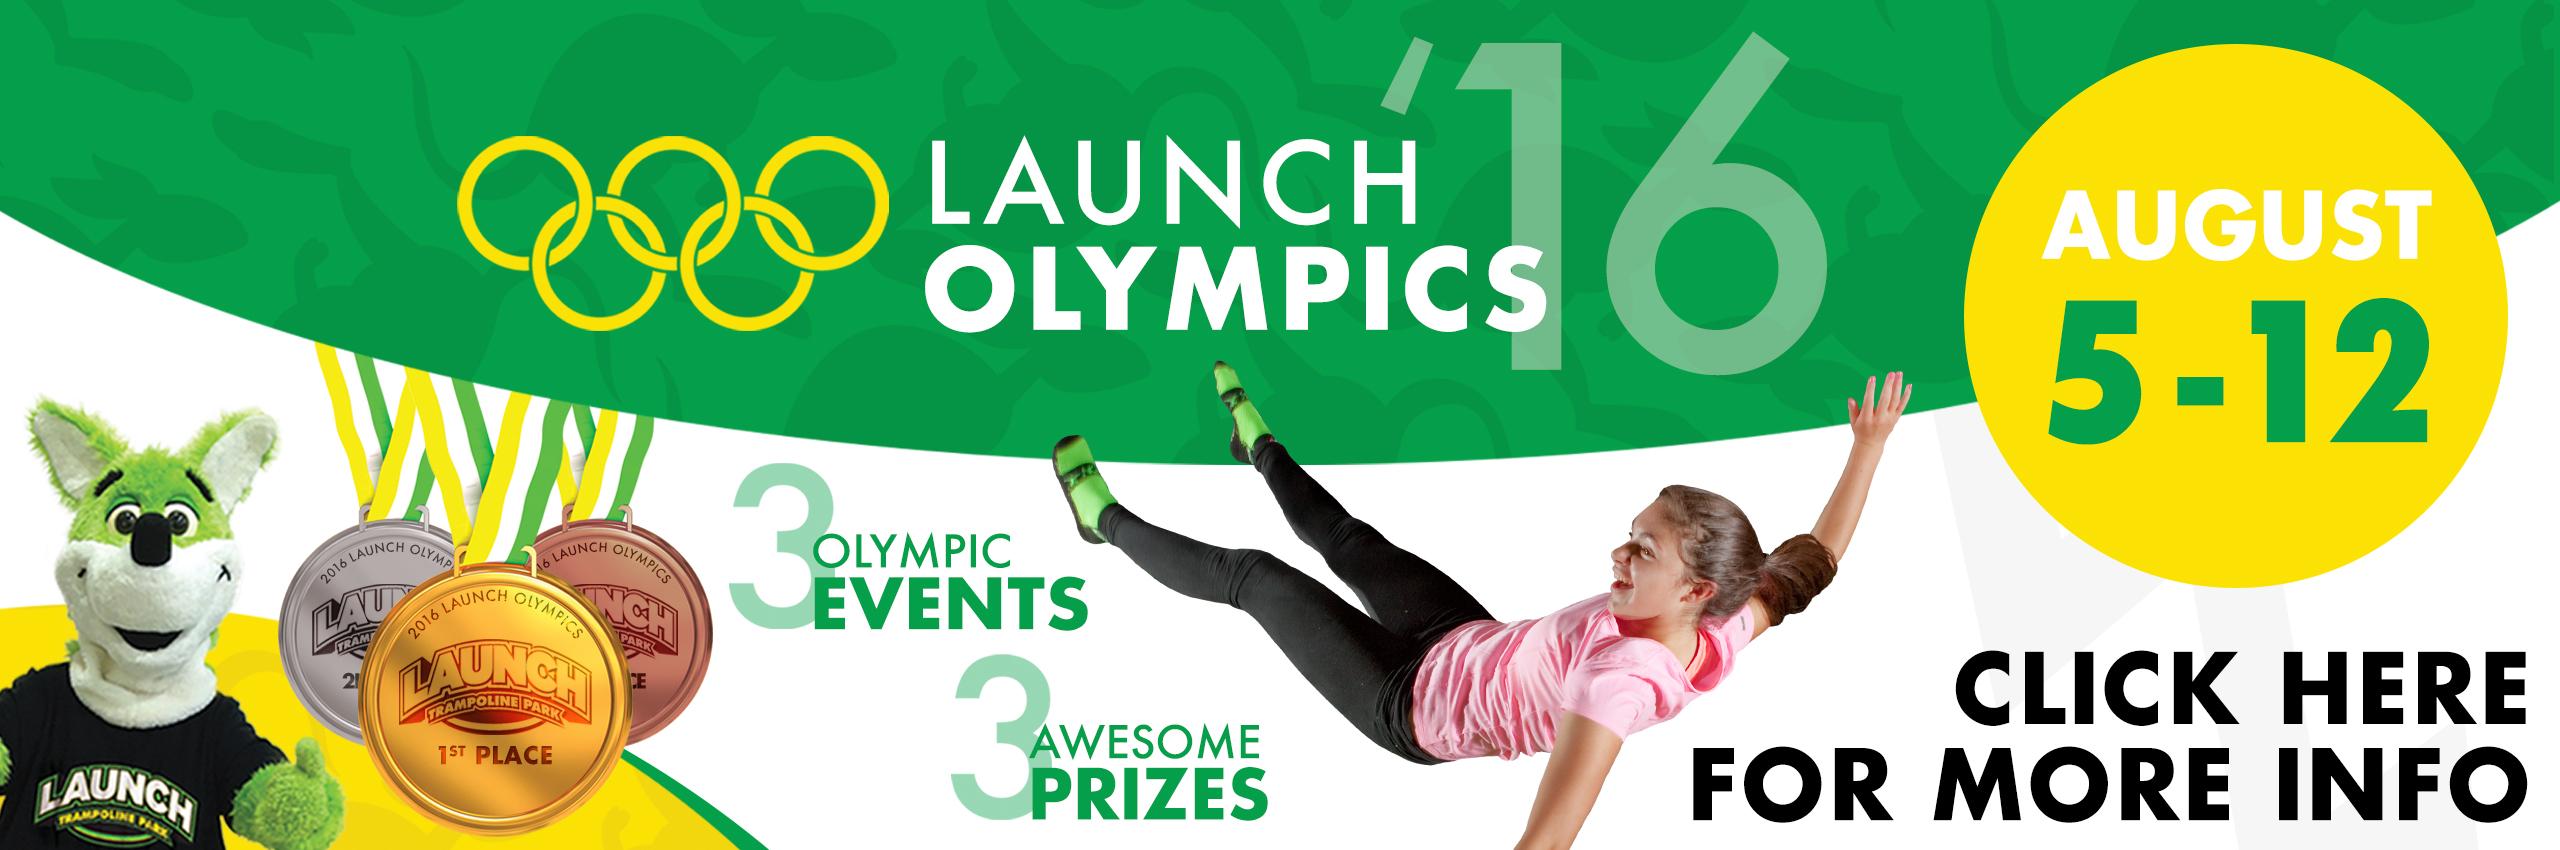 Launch Olympics